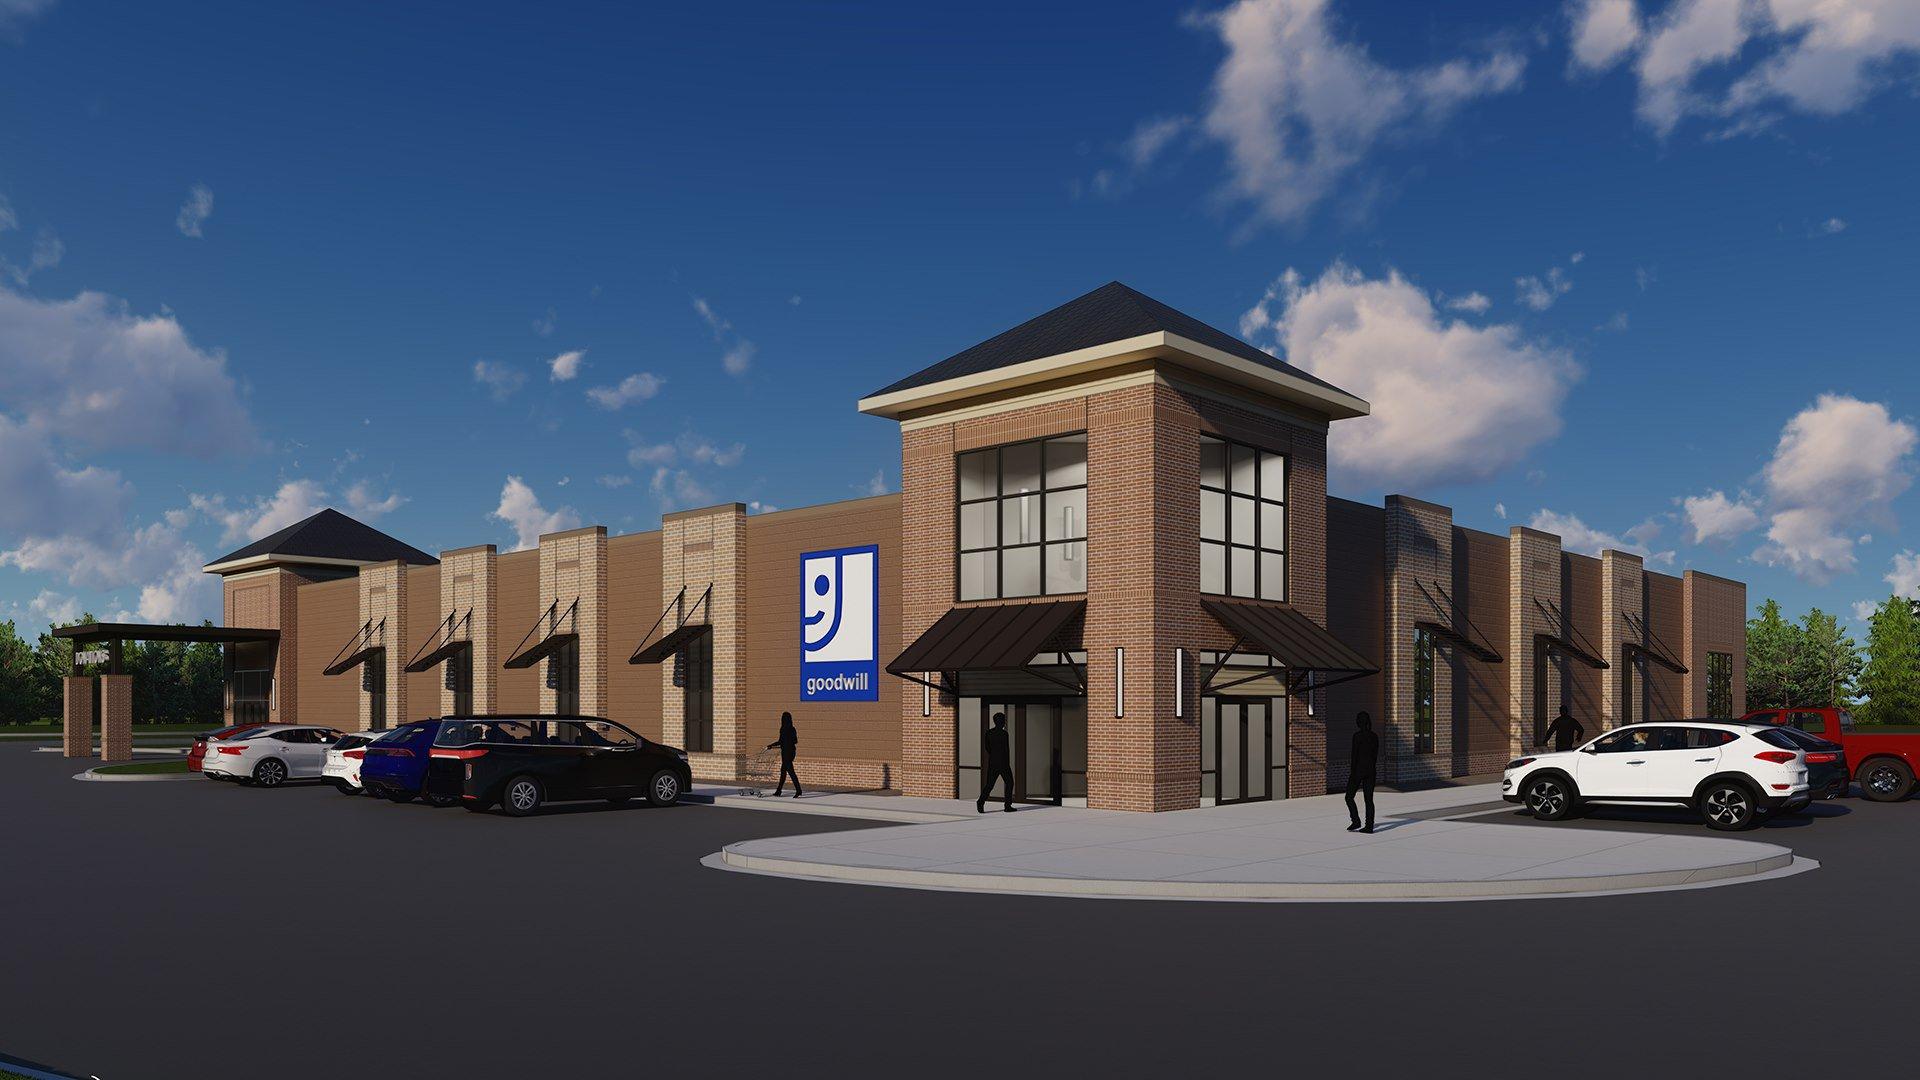 Goodwill International Breaks Ground on New Building in Chesnee, SC